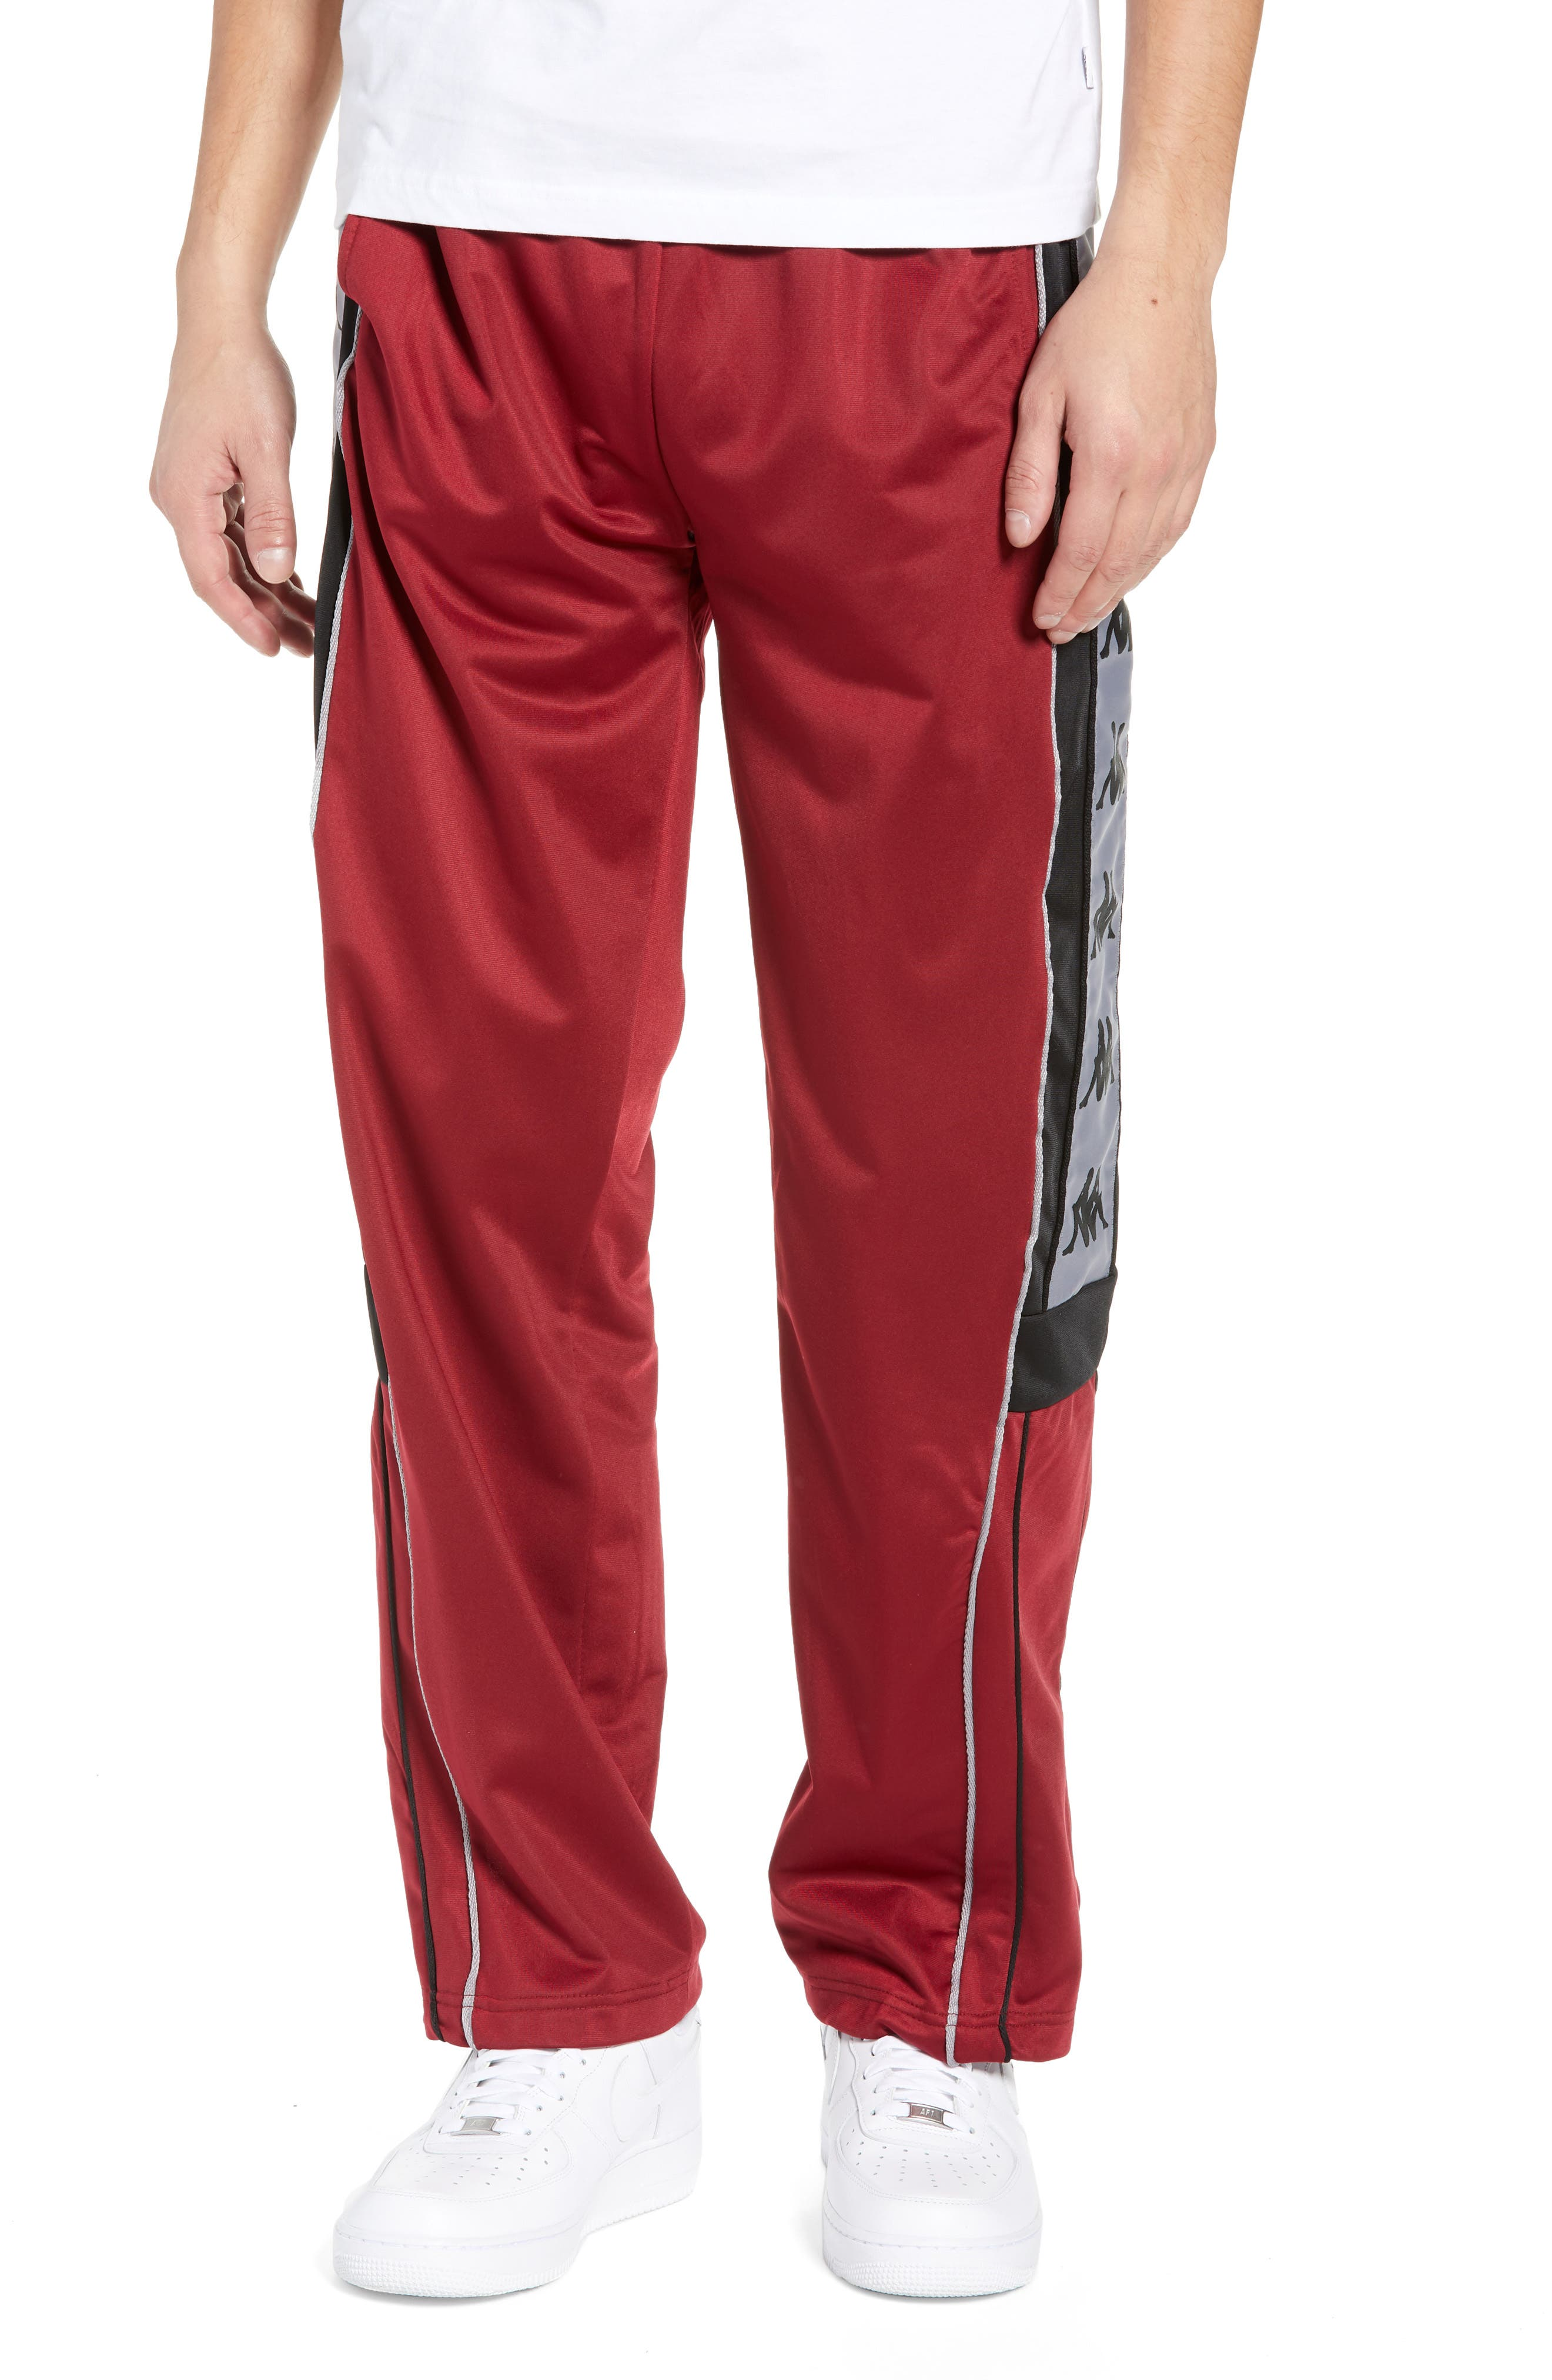 Active 222 Banda Snap-Away Warm-Up Pants,                         Main,                         color, RED BORDEAUX BLACK